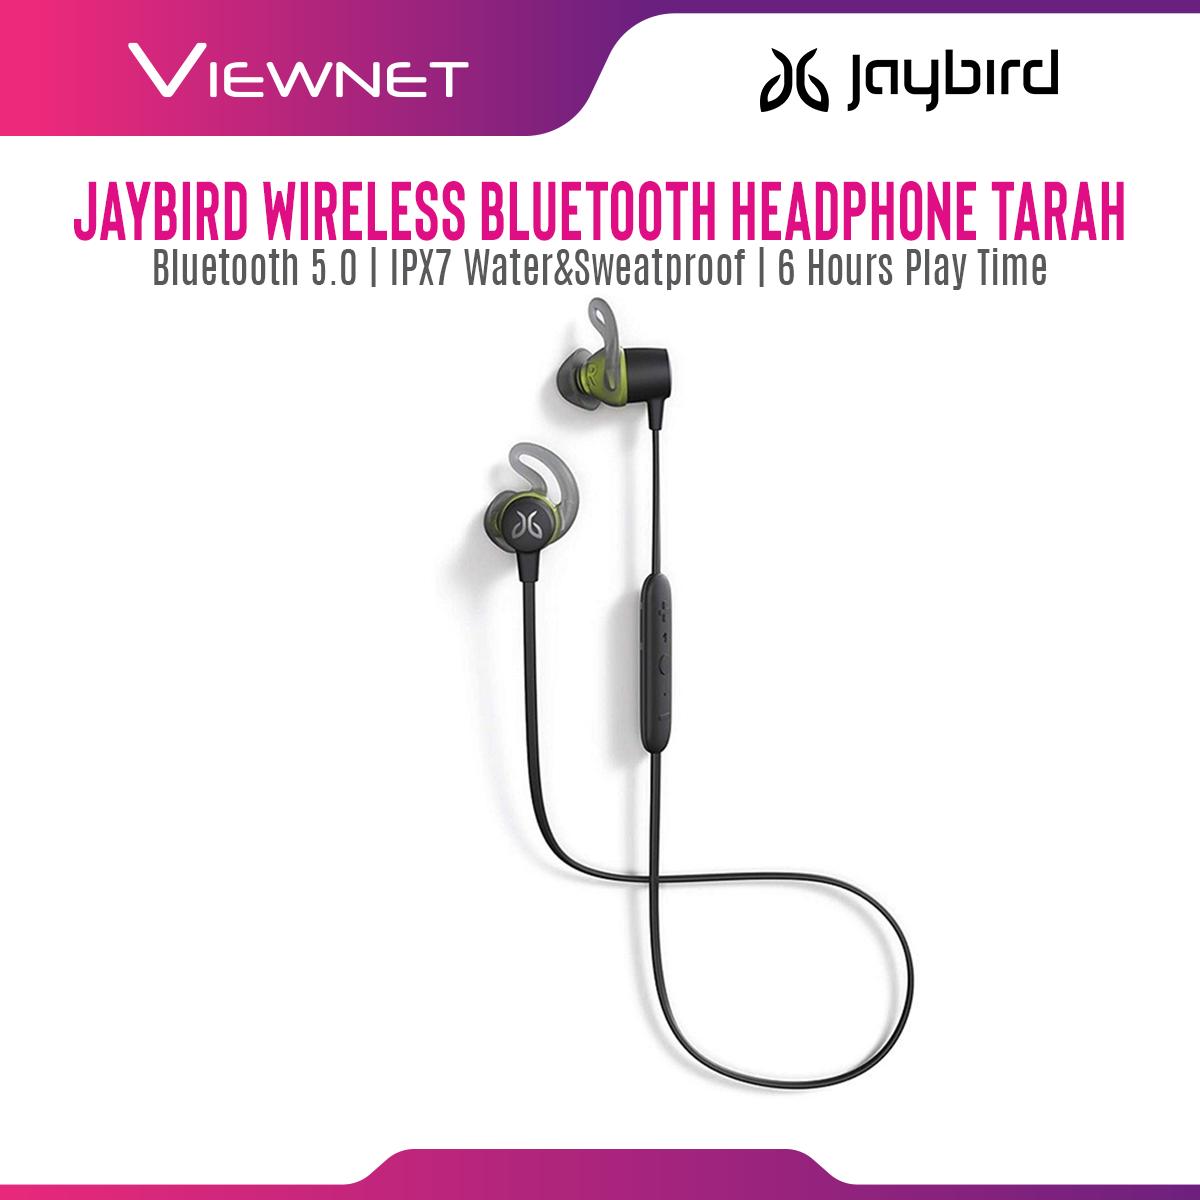 Jaybird Earset Wireless Bluetooth Tarah Sport with IPX7 Waterproof & Sweatproof, Premium Sound with Custom EQ, 6-Hour Battery Life, Music and Calls, Sport Fit